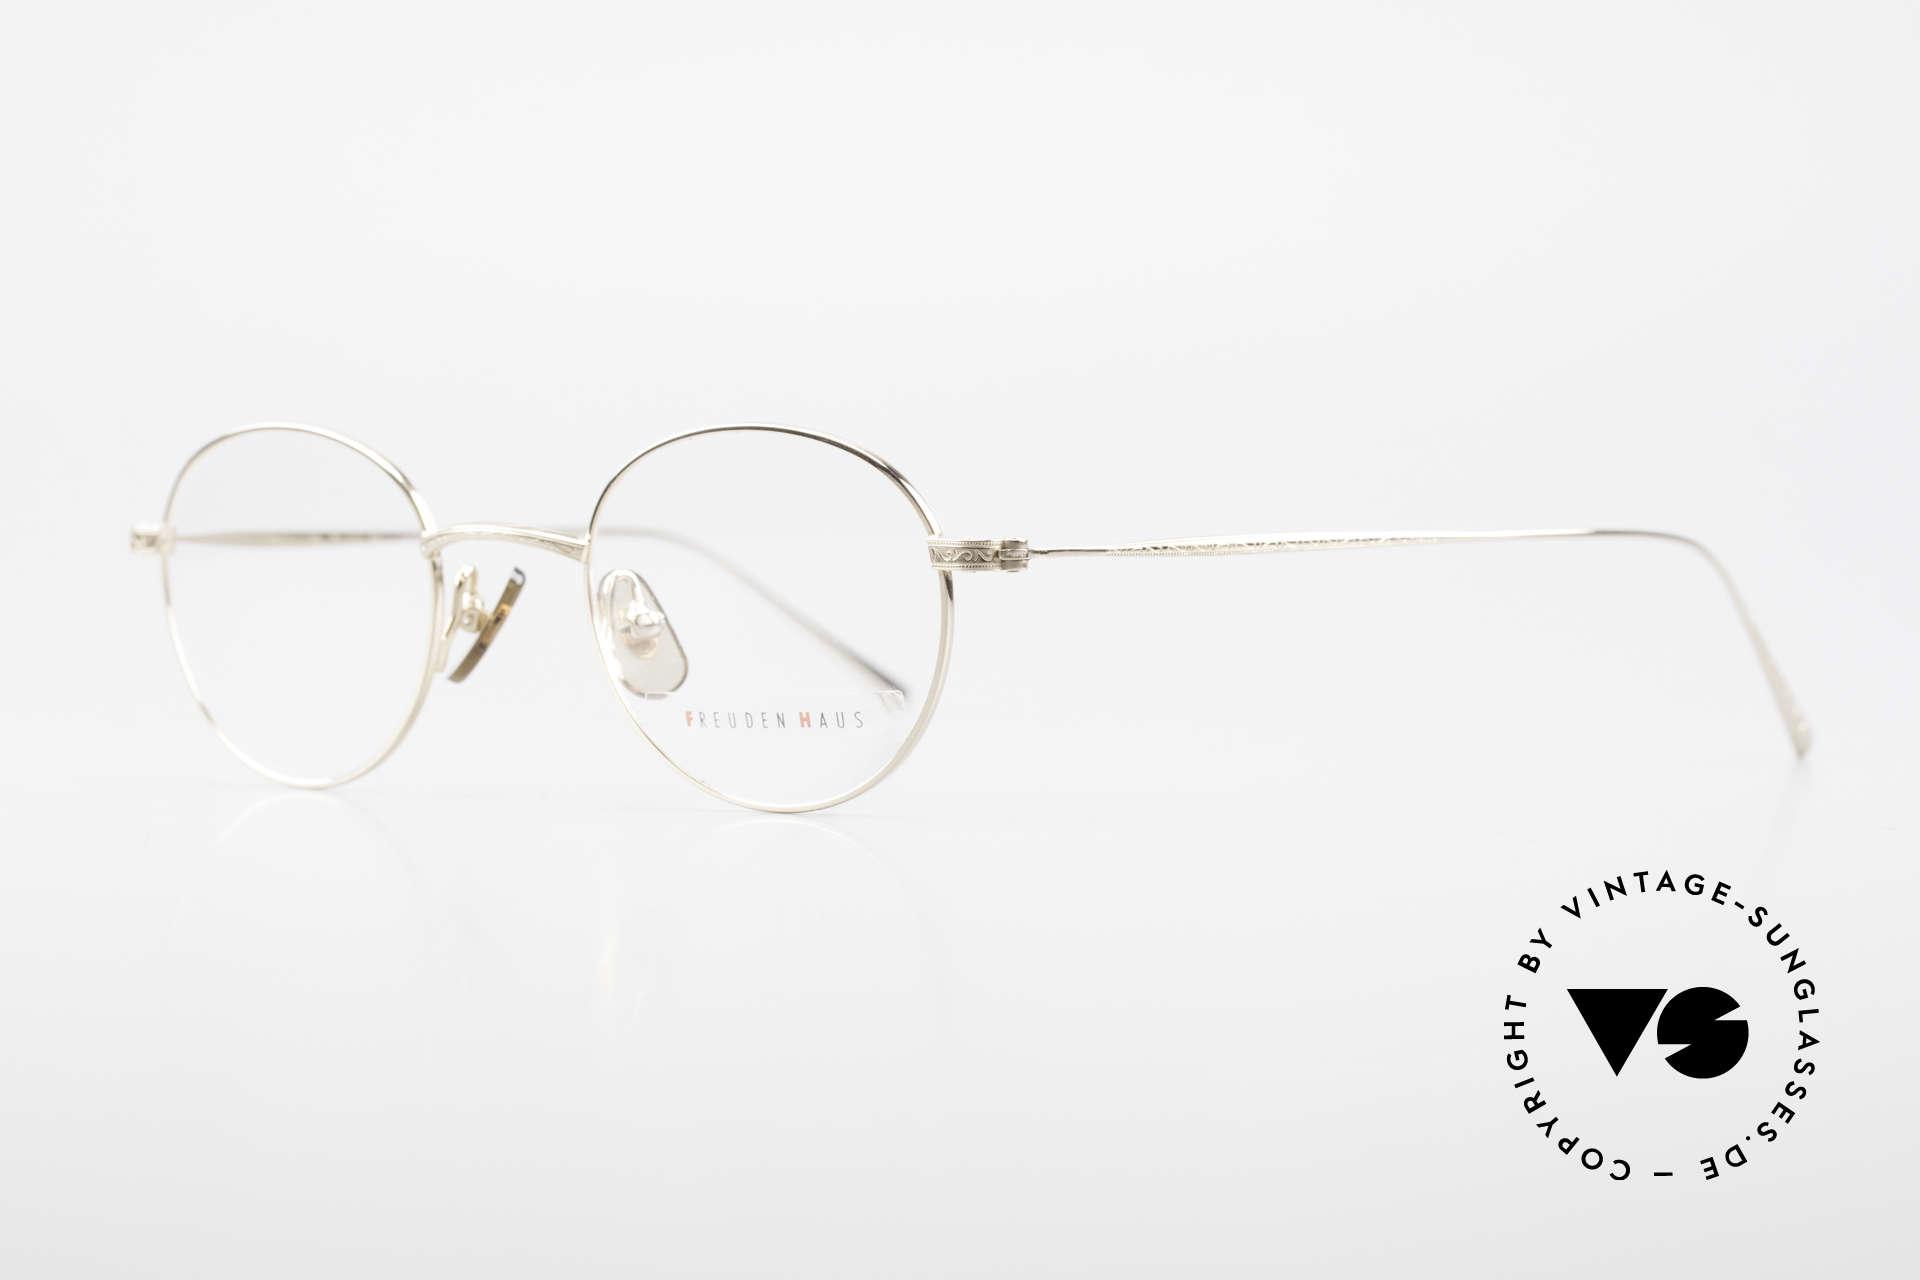 Freudenhaus Garland Small Round Designer Frame, top notch craftsmanship (JP), gold-plated titanium, Made for Men and Women